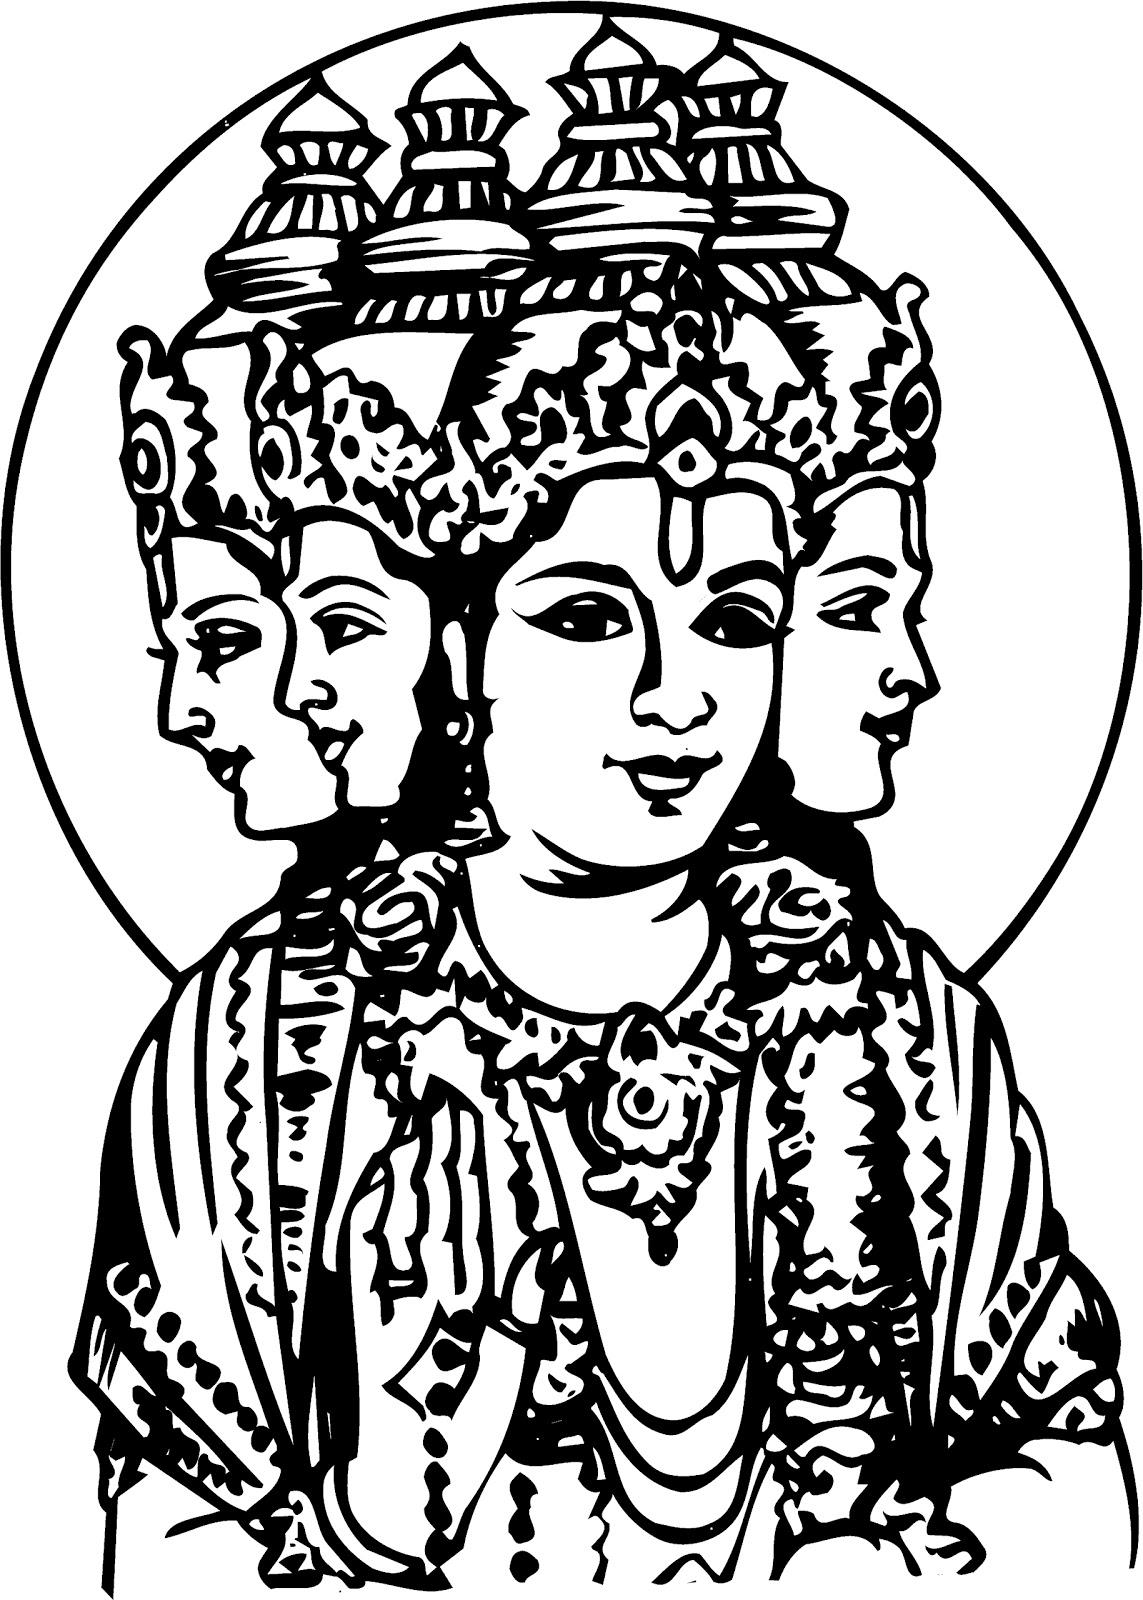 Line Art Hindu Gods : All in one wallpapers pencil drawings hindu gods